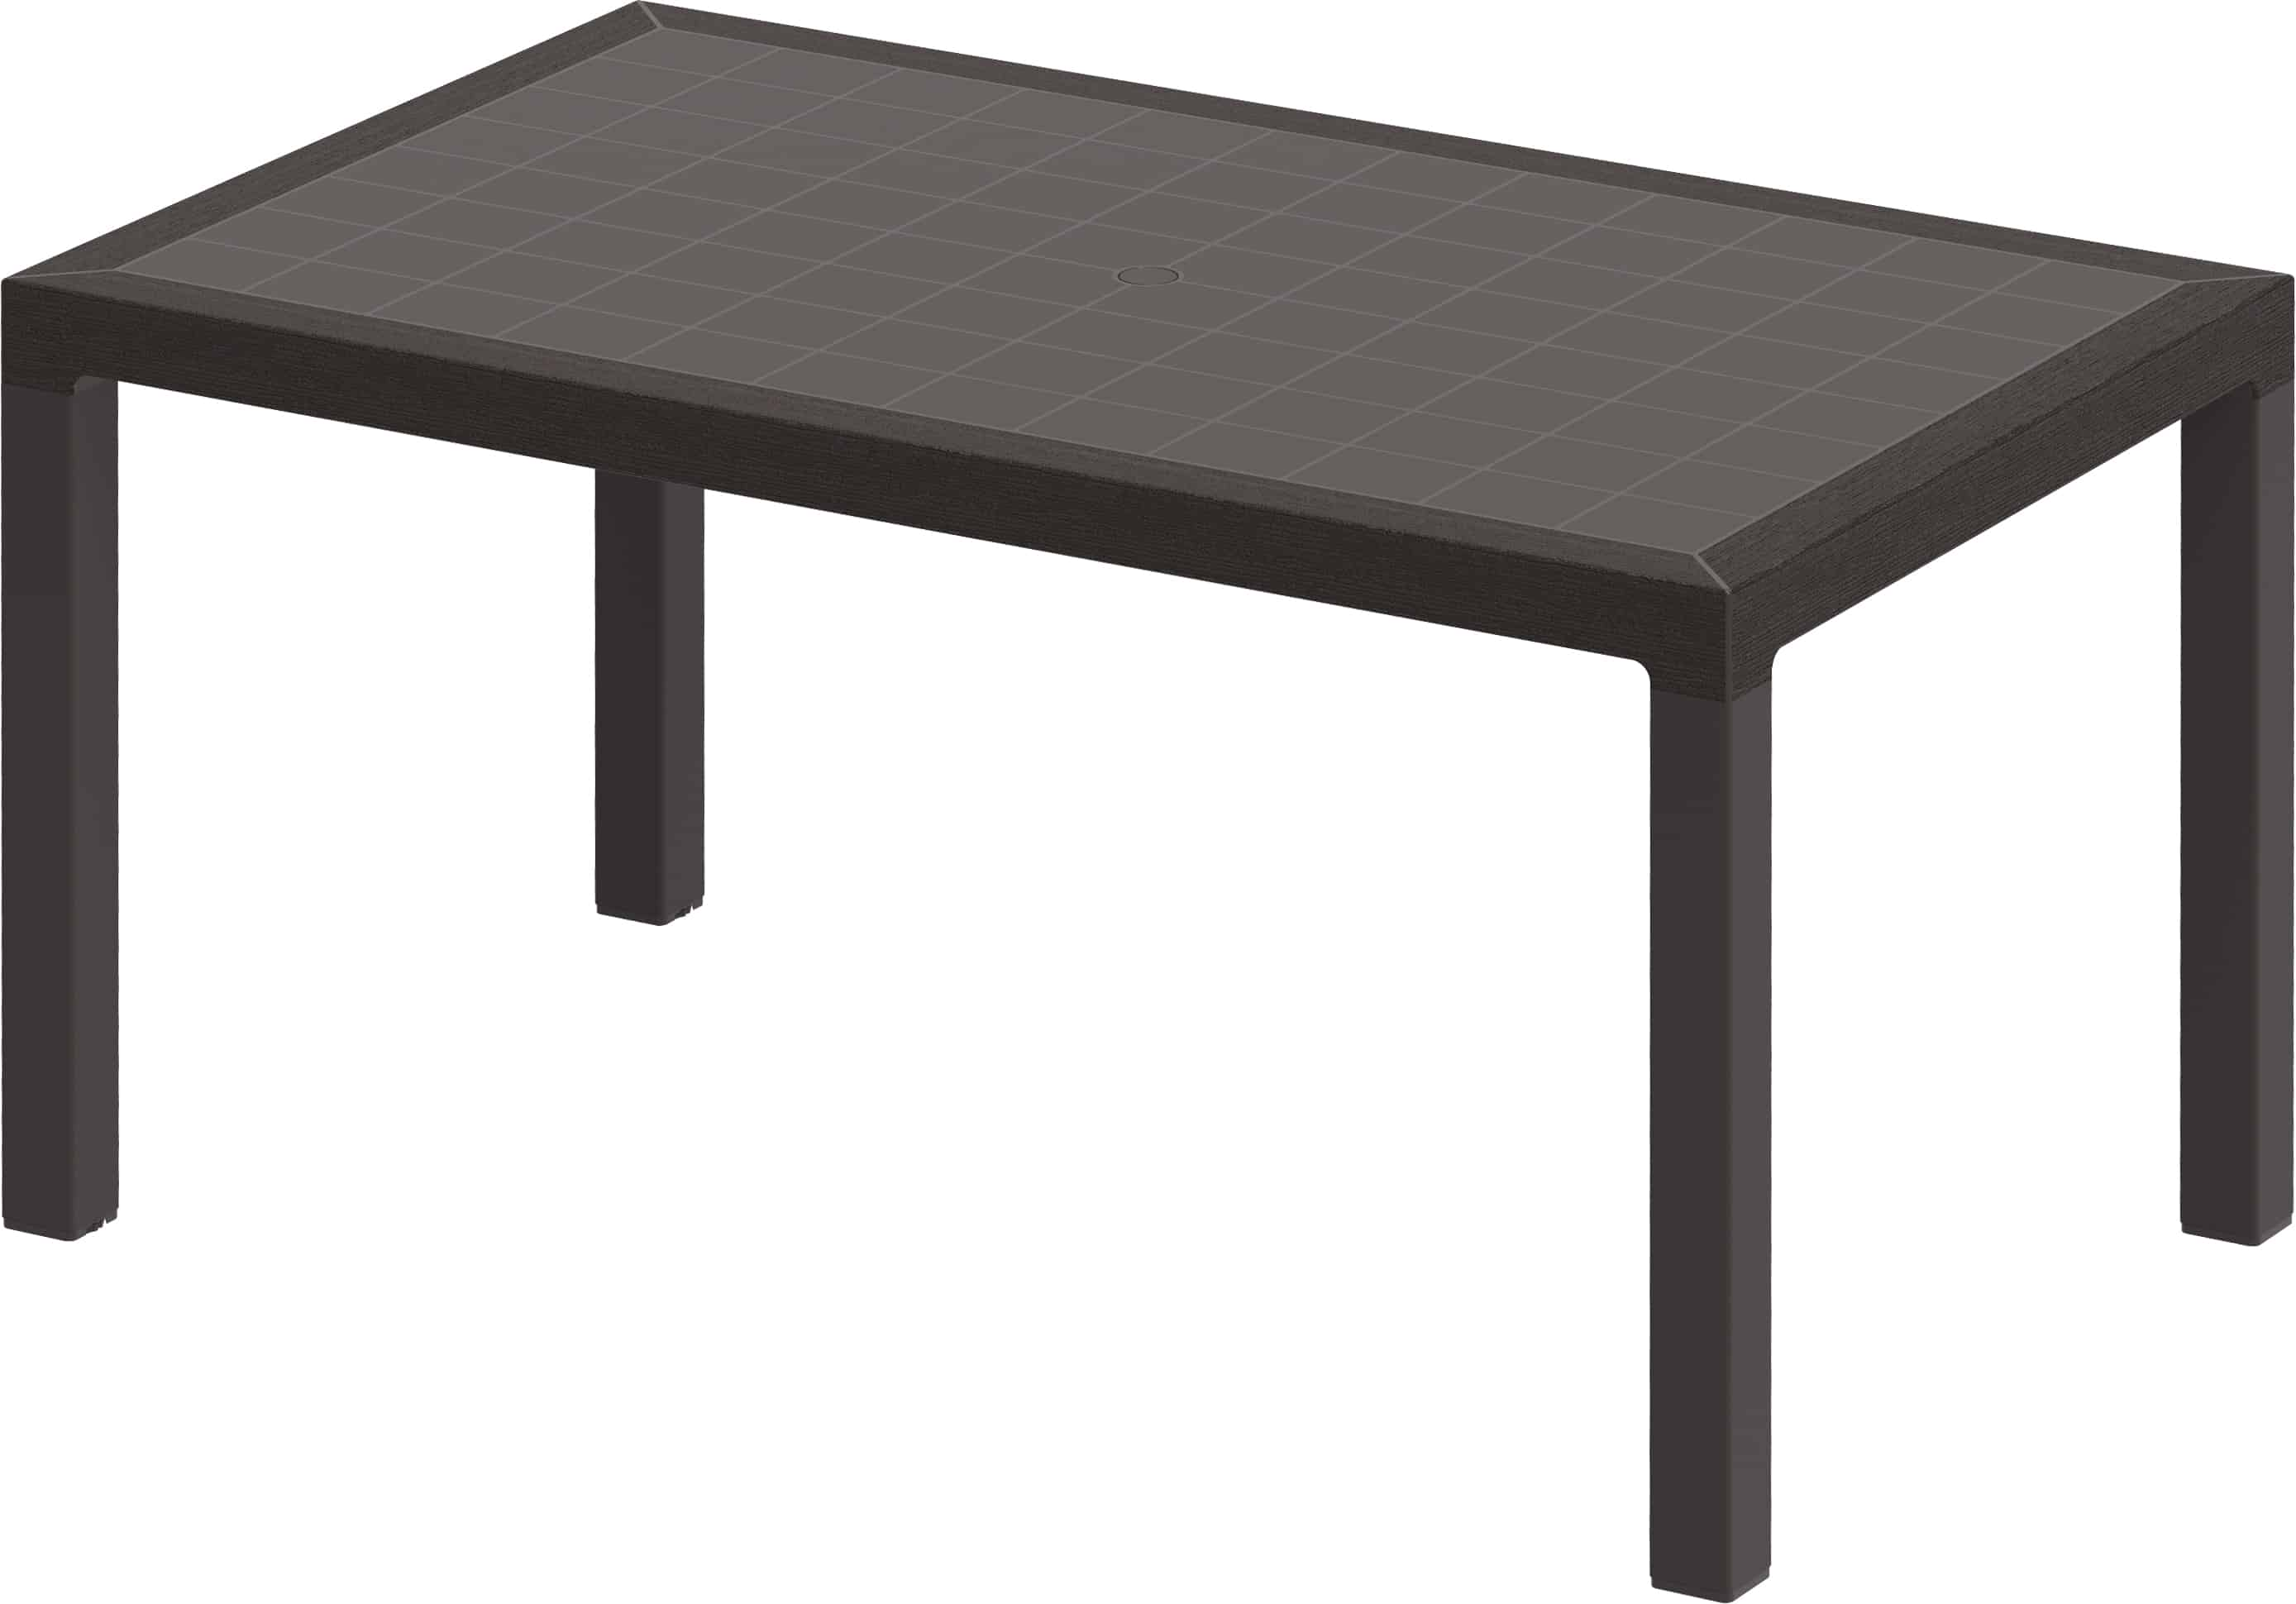 CedarGrain Table